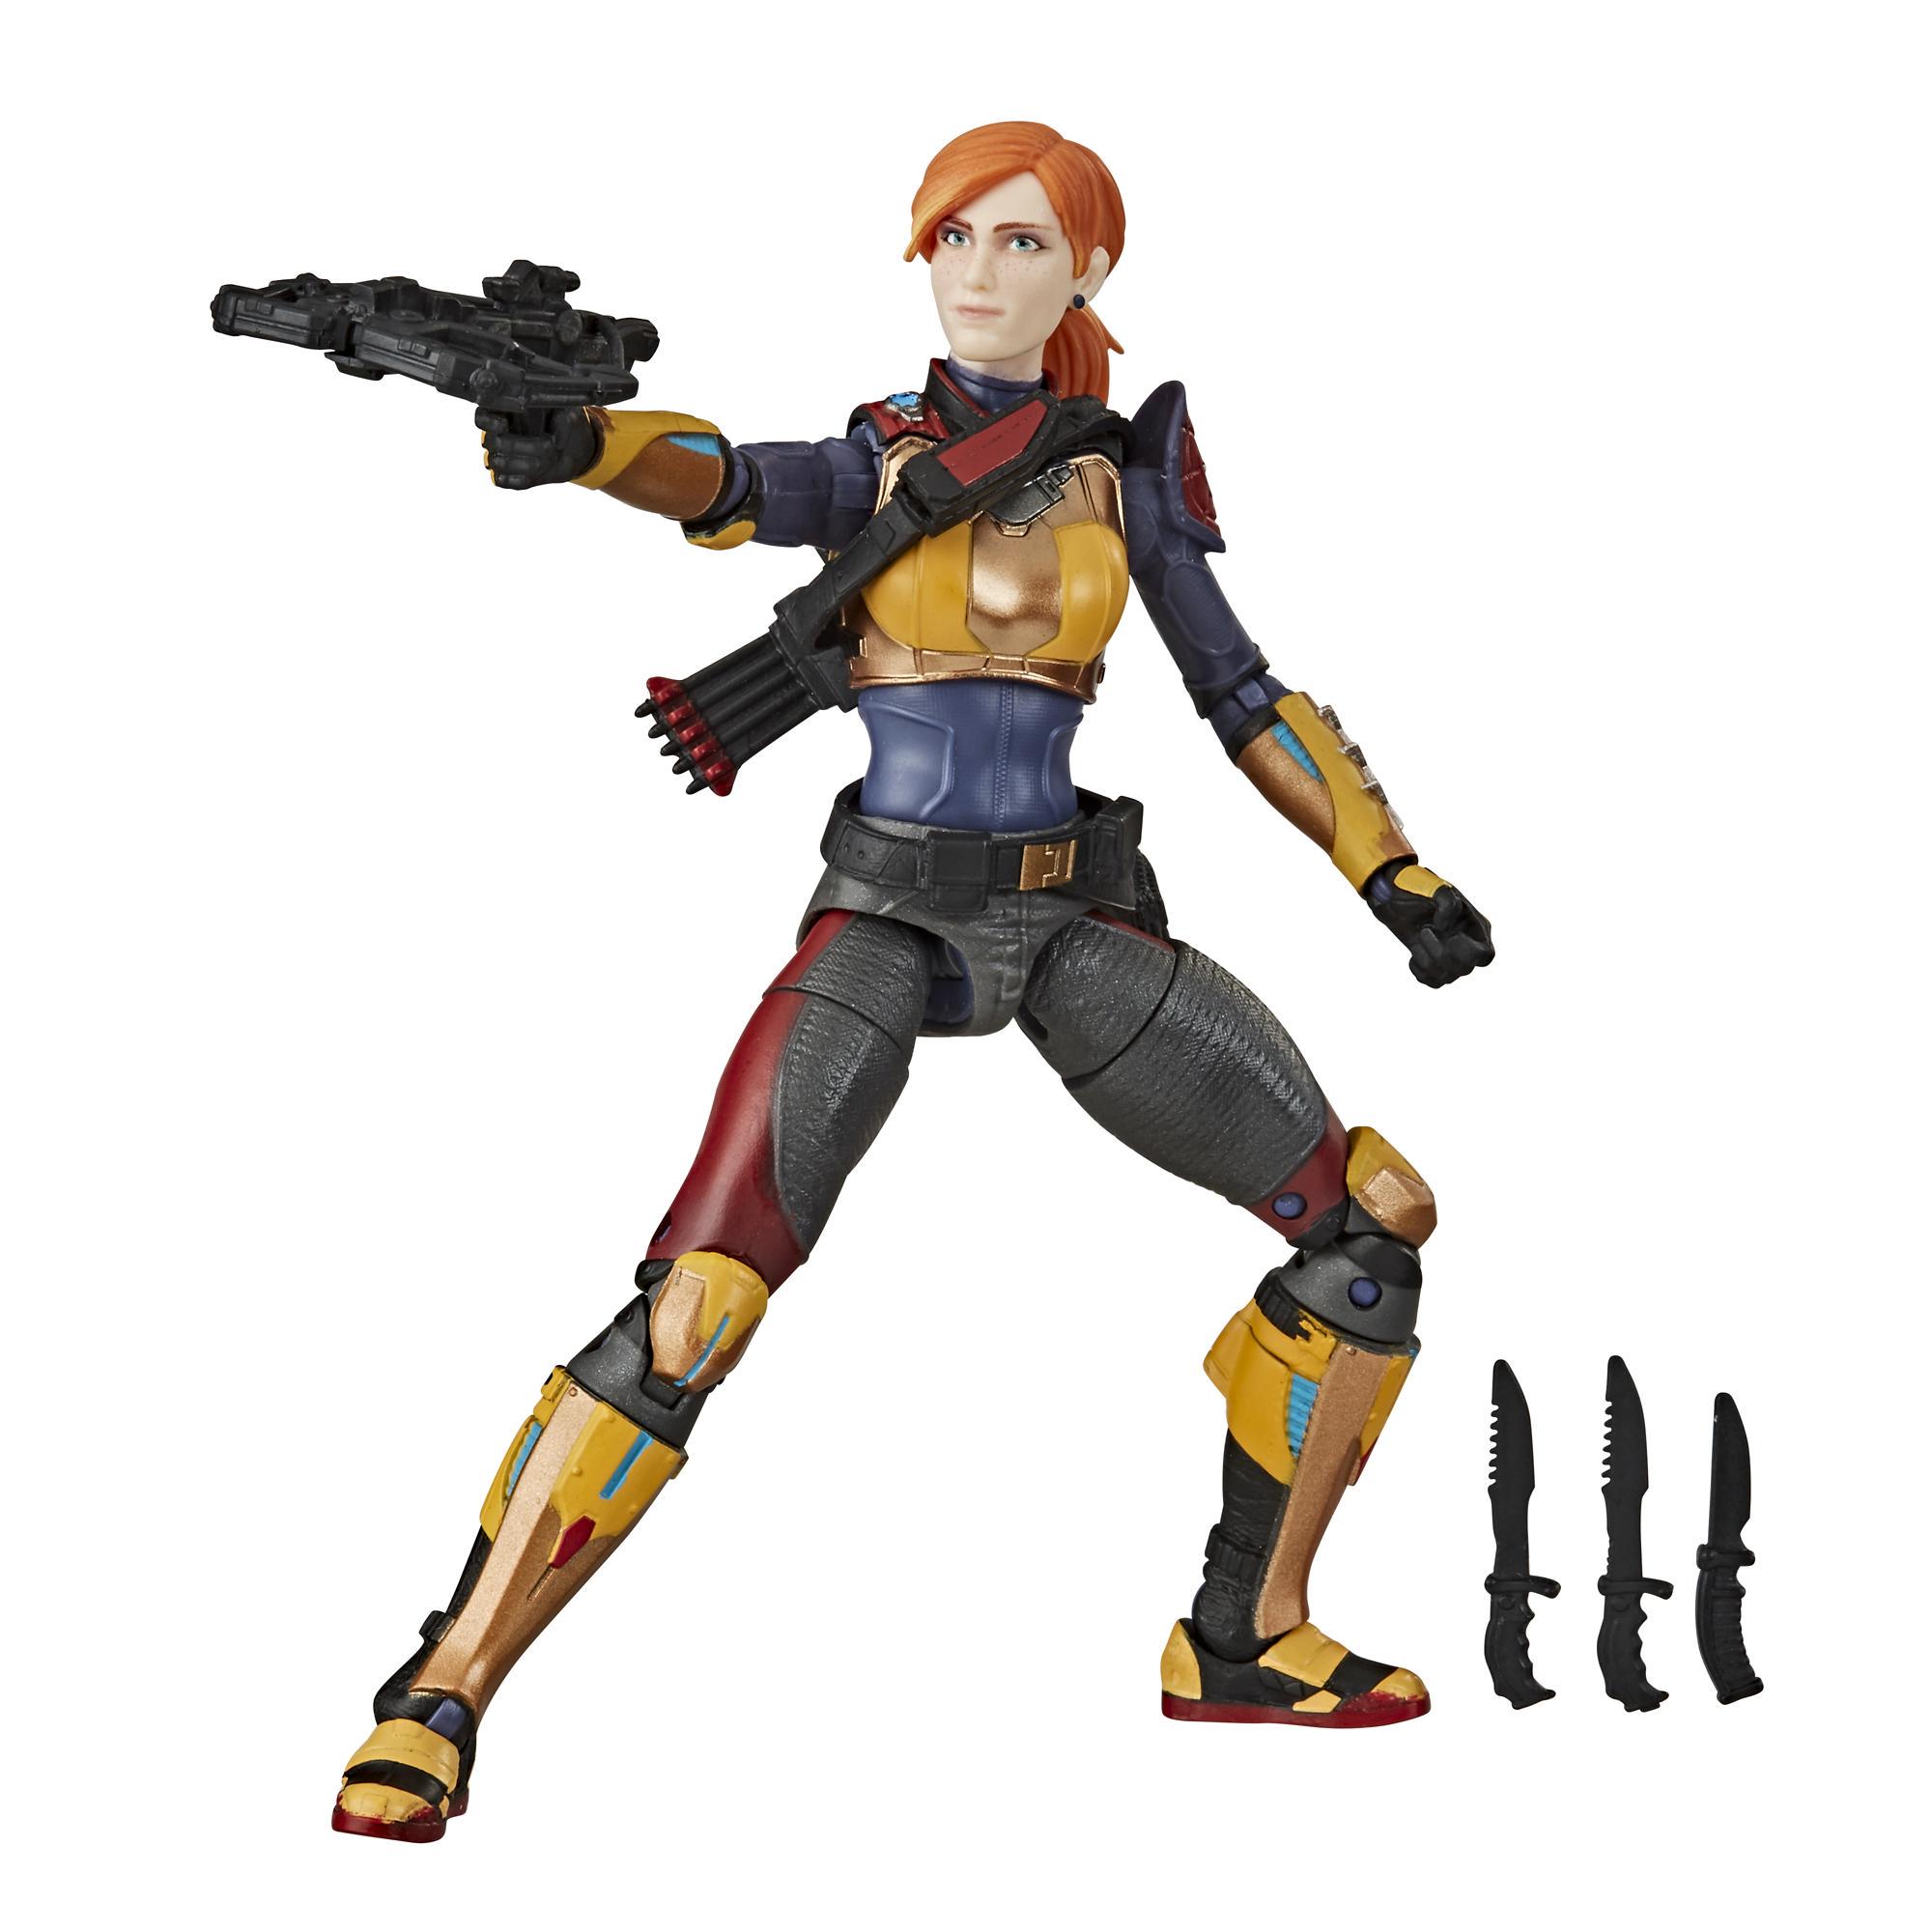 G.I. Joe Classified Series - Figura Scarlett 05 con múltiples accesorios